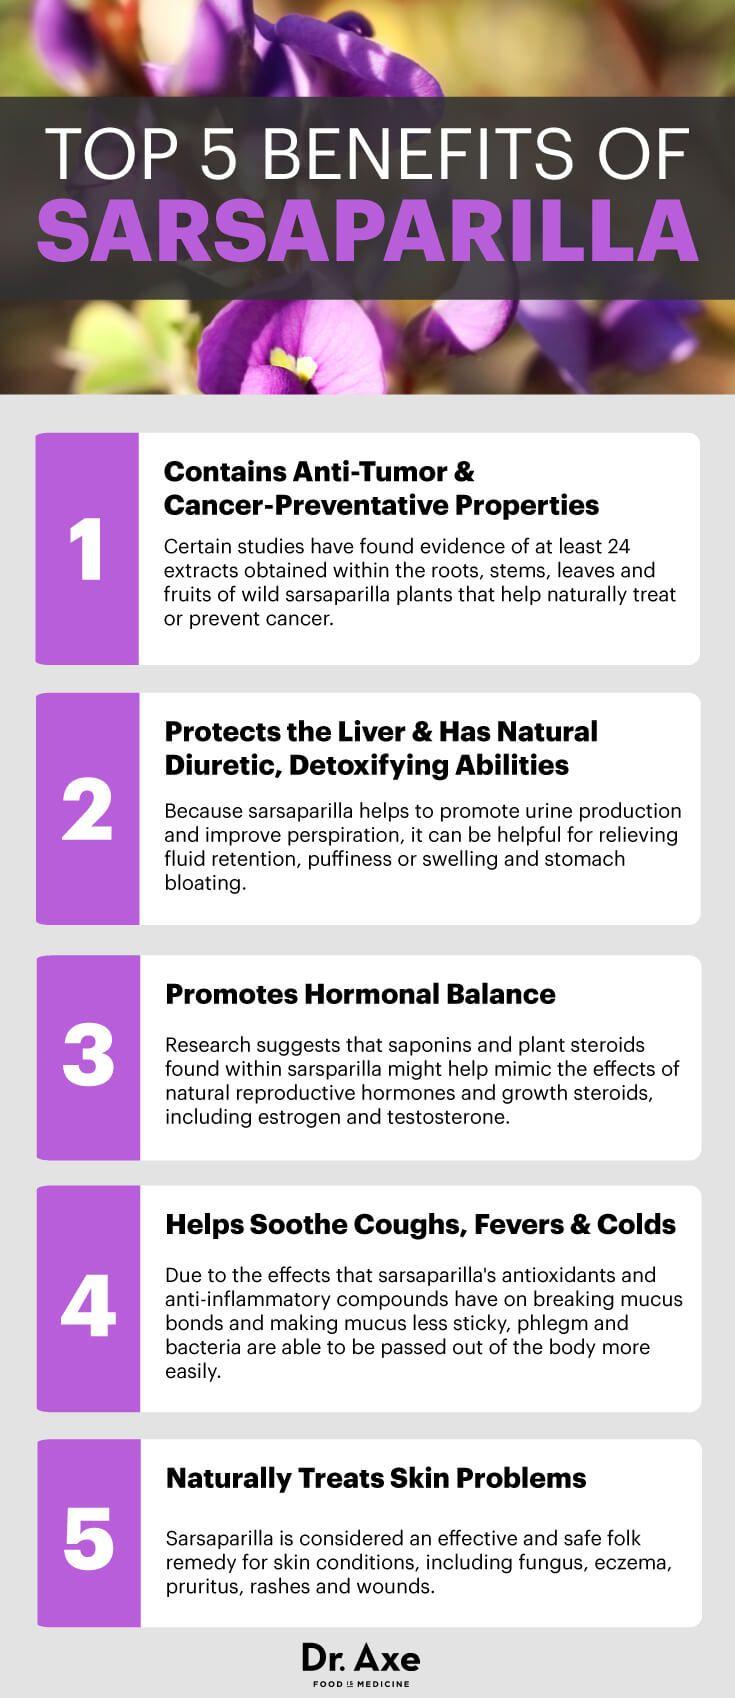 Sarsaparilla Uses, Sarsaparilla Benefits & Sarsaparilla Recipes - Dr. Axe